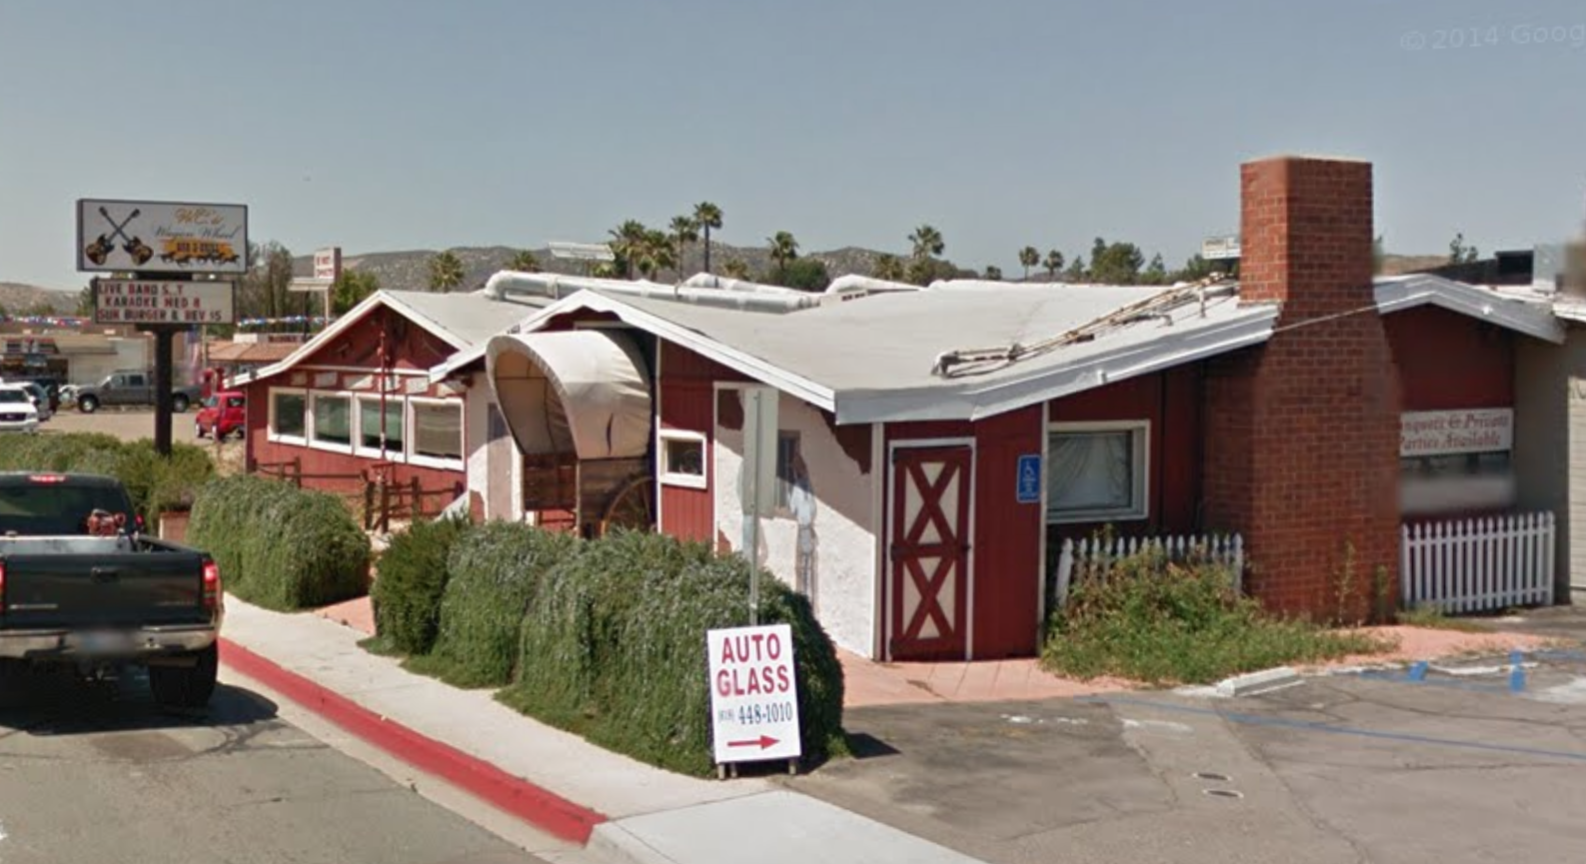 Western Mural Wagon Wheel Restaurant exterior Santee California 3.png